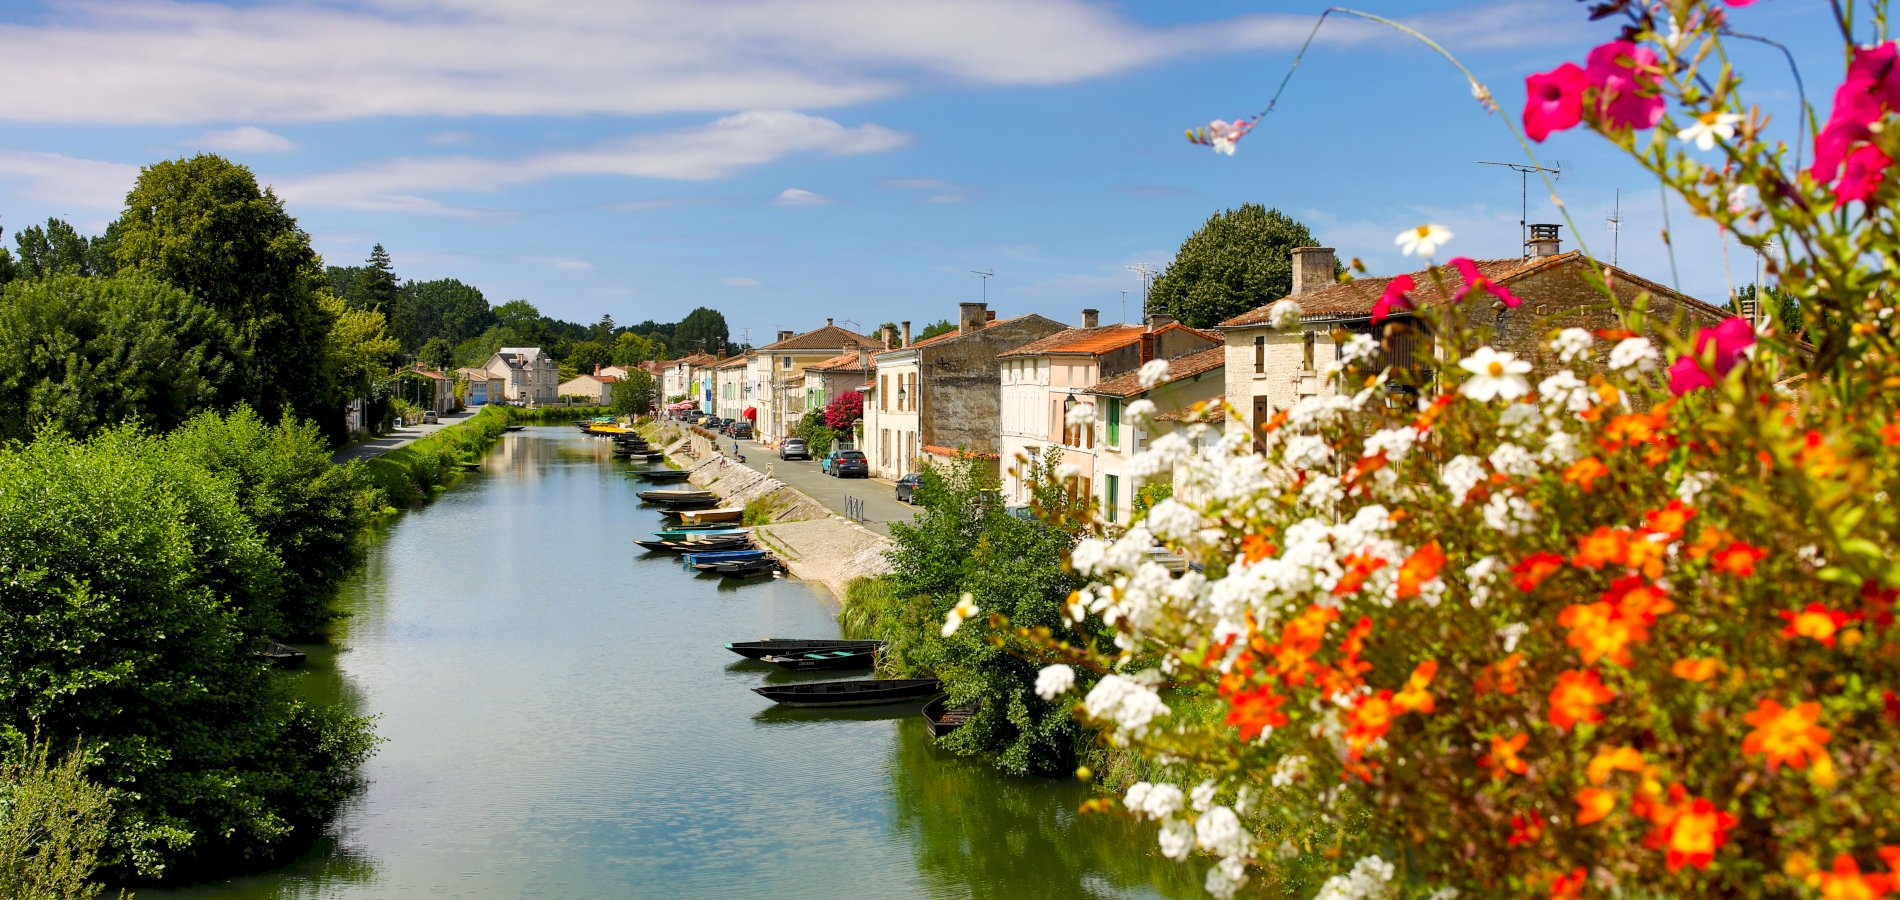 Ophorus Tours - Green Venice & Wine Tasting Private Shore Excursion From La Rochelle